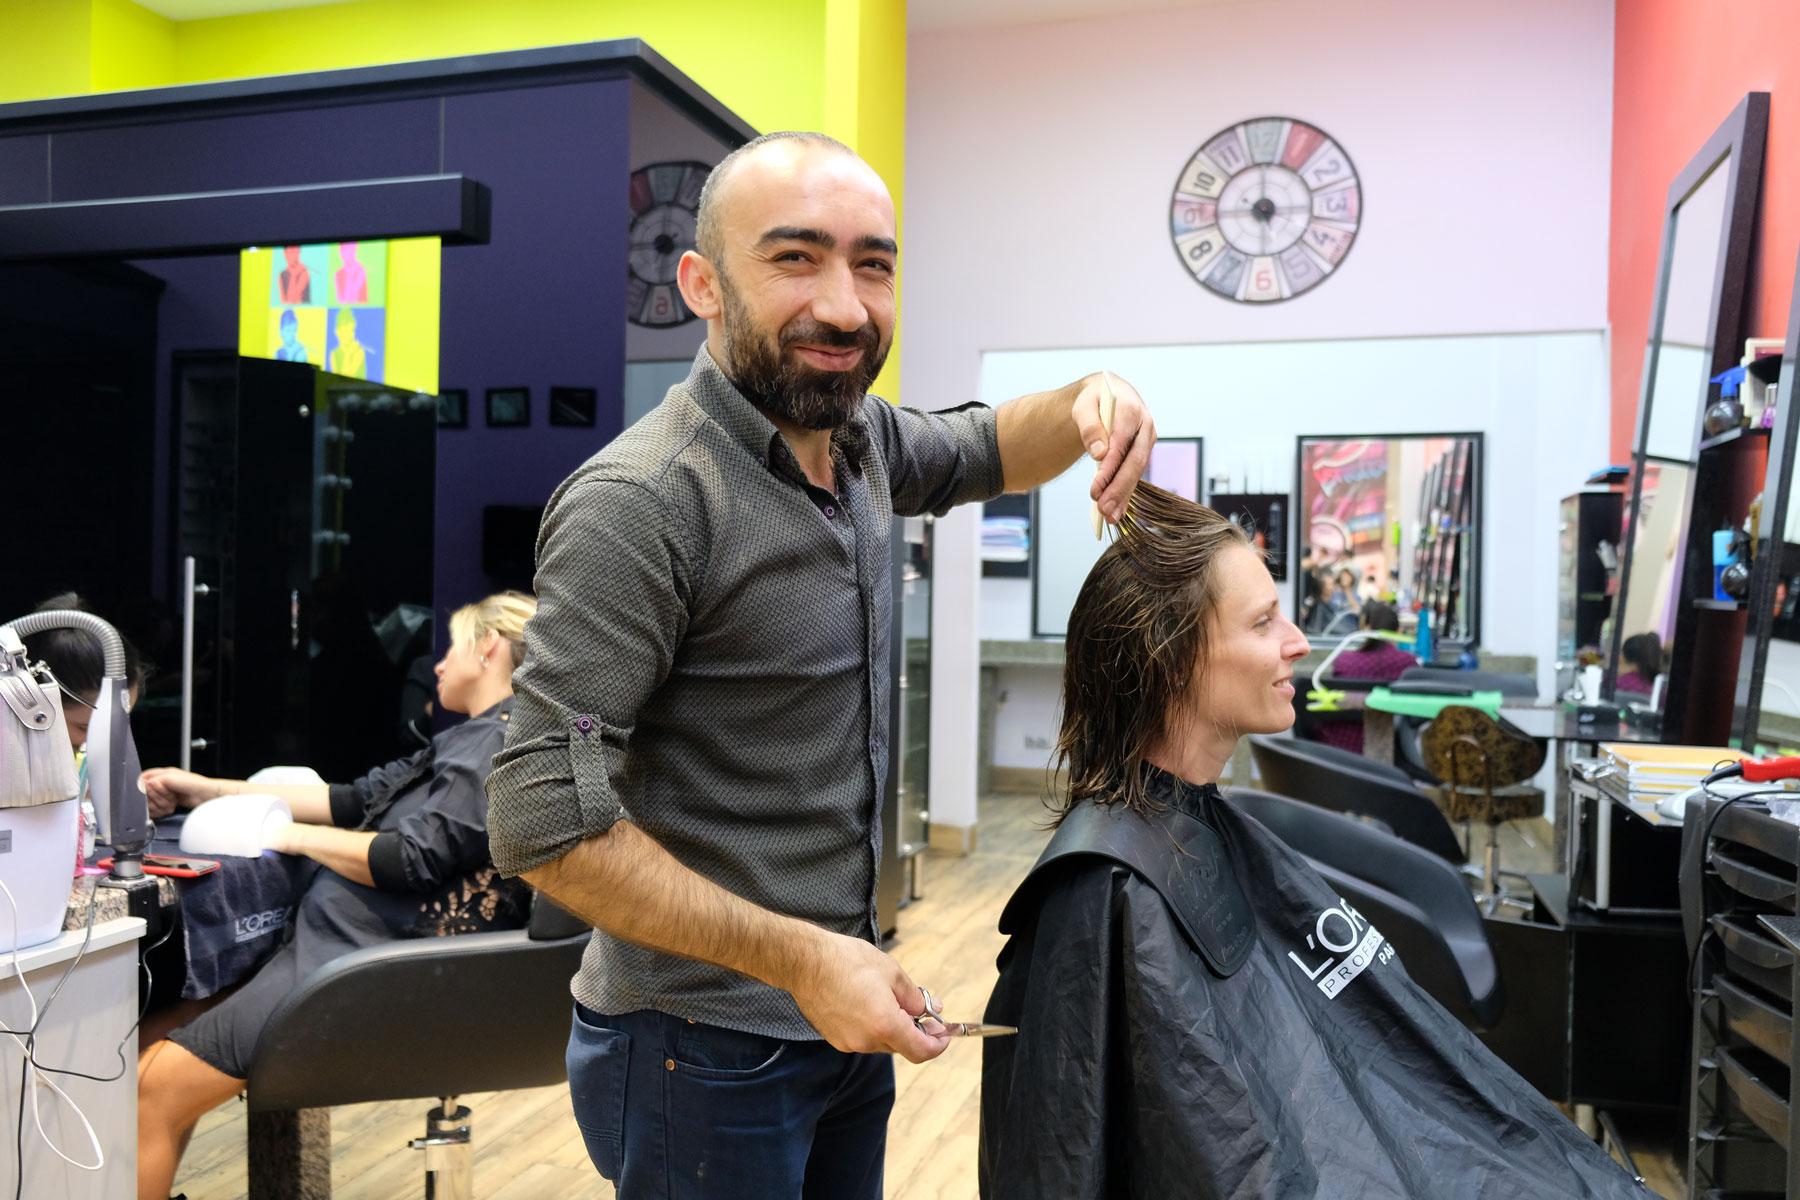 Leo beim Friseur.